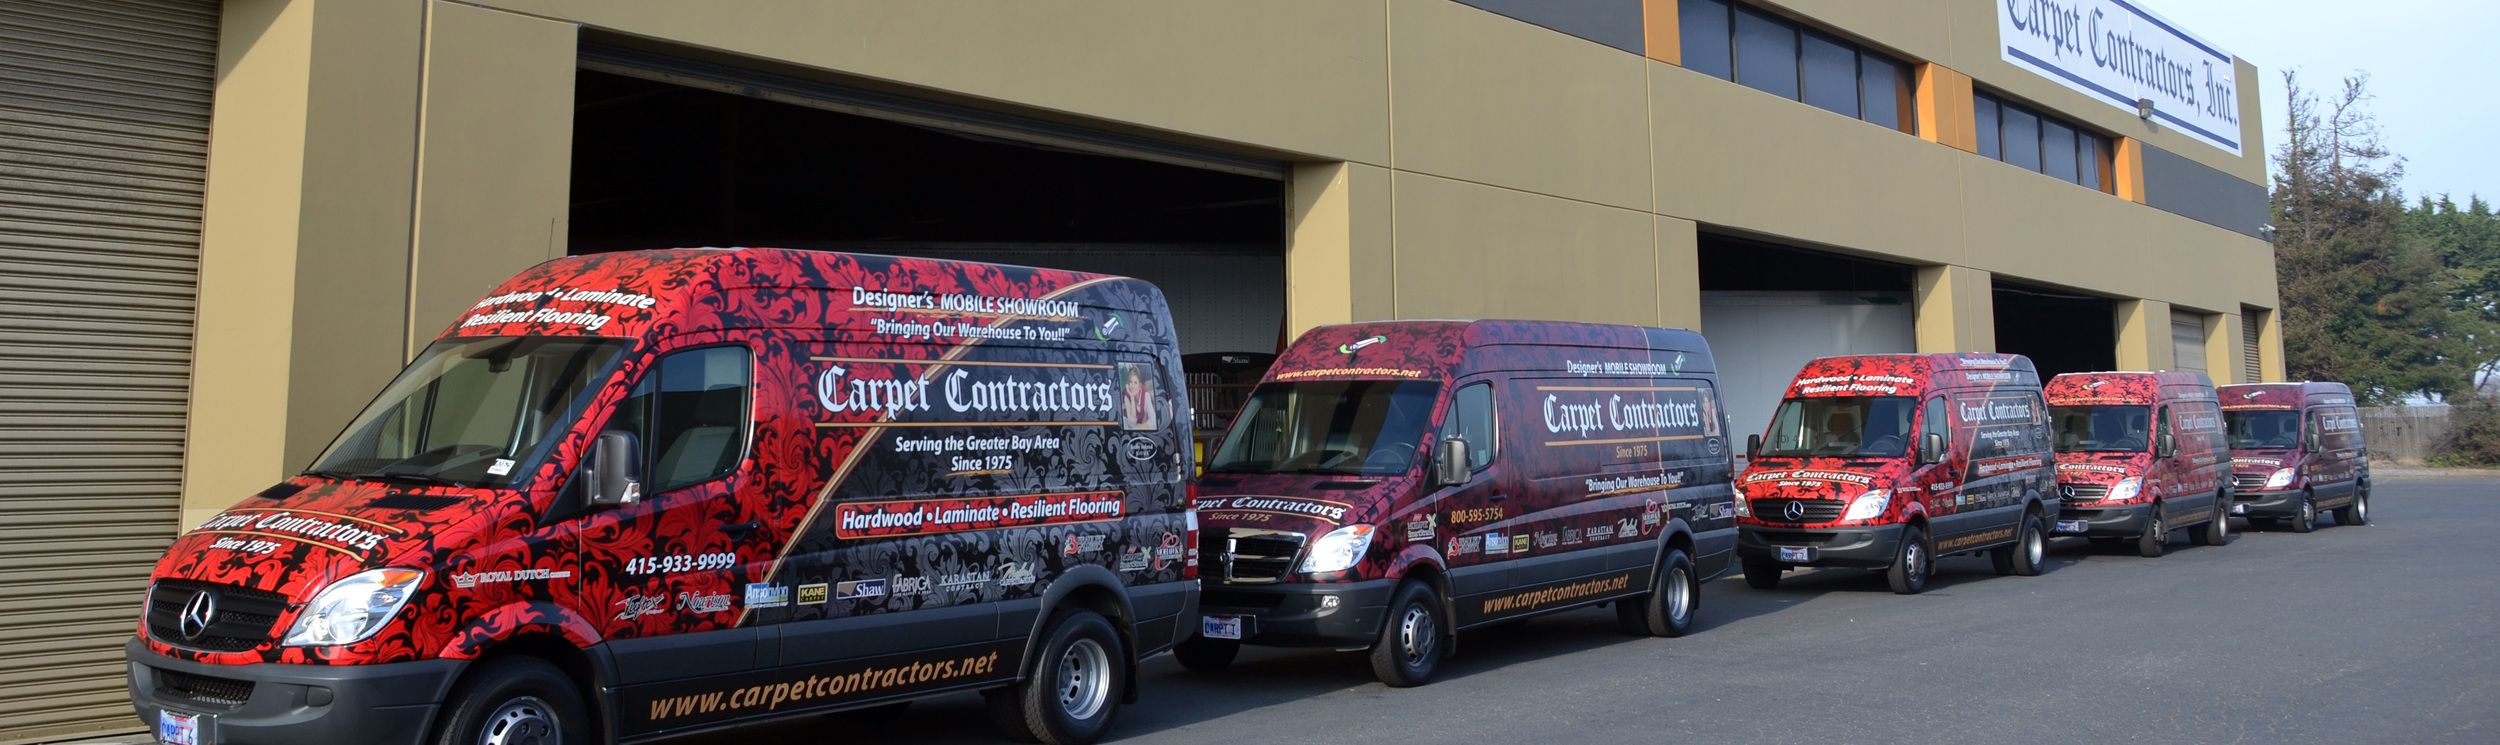 Trucks linegformat2500w carpet contractors san francisco baanklon Image collections